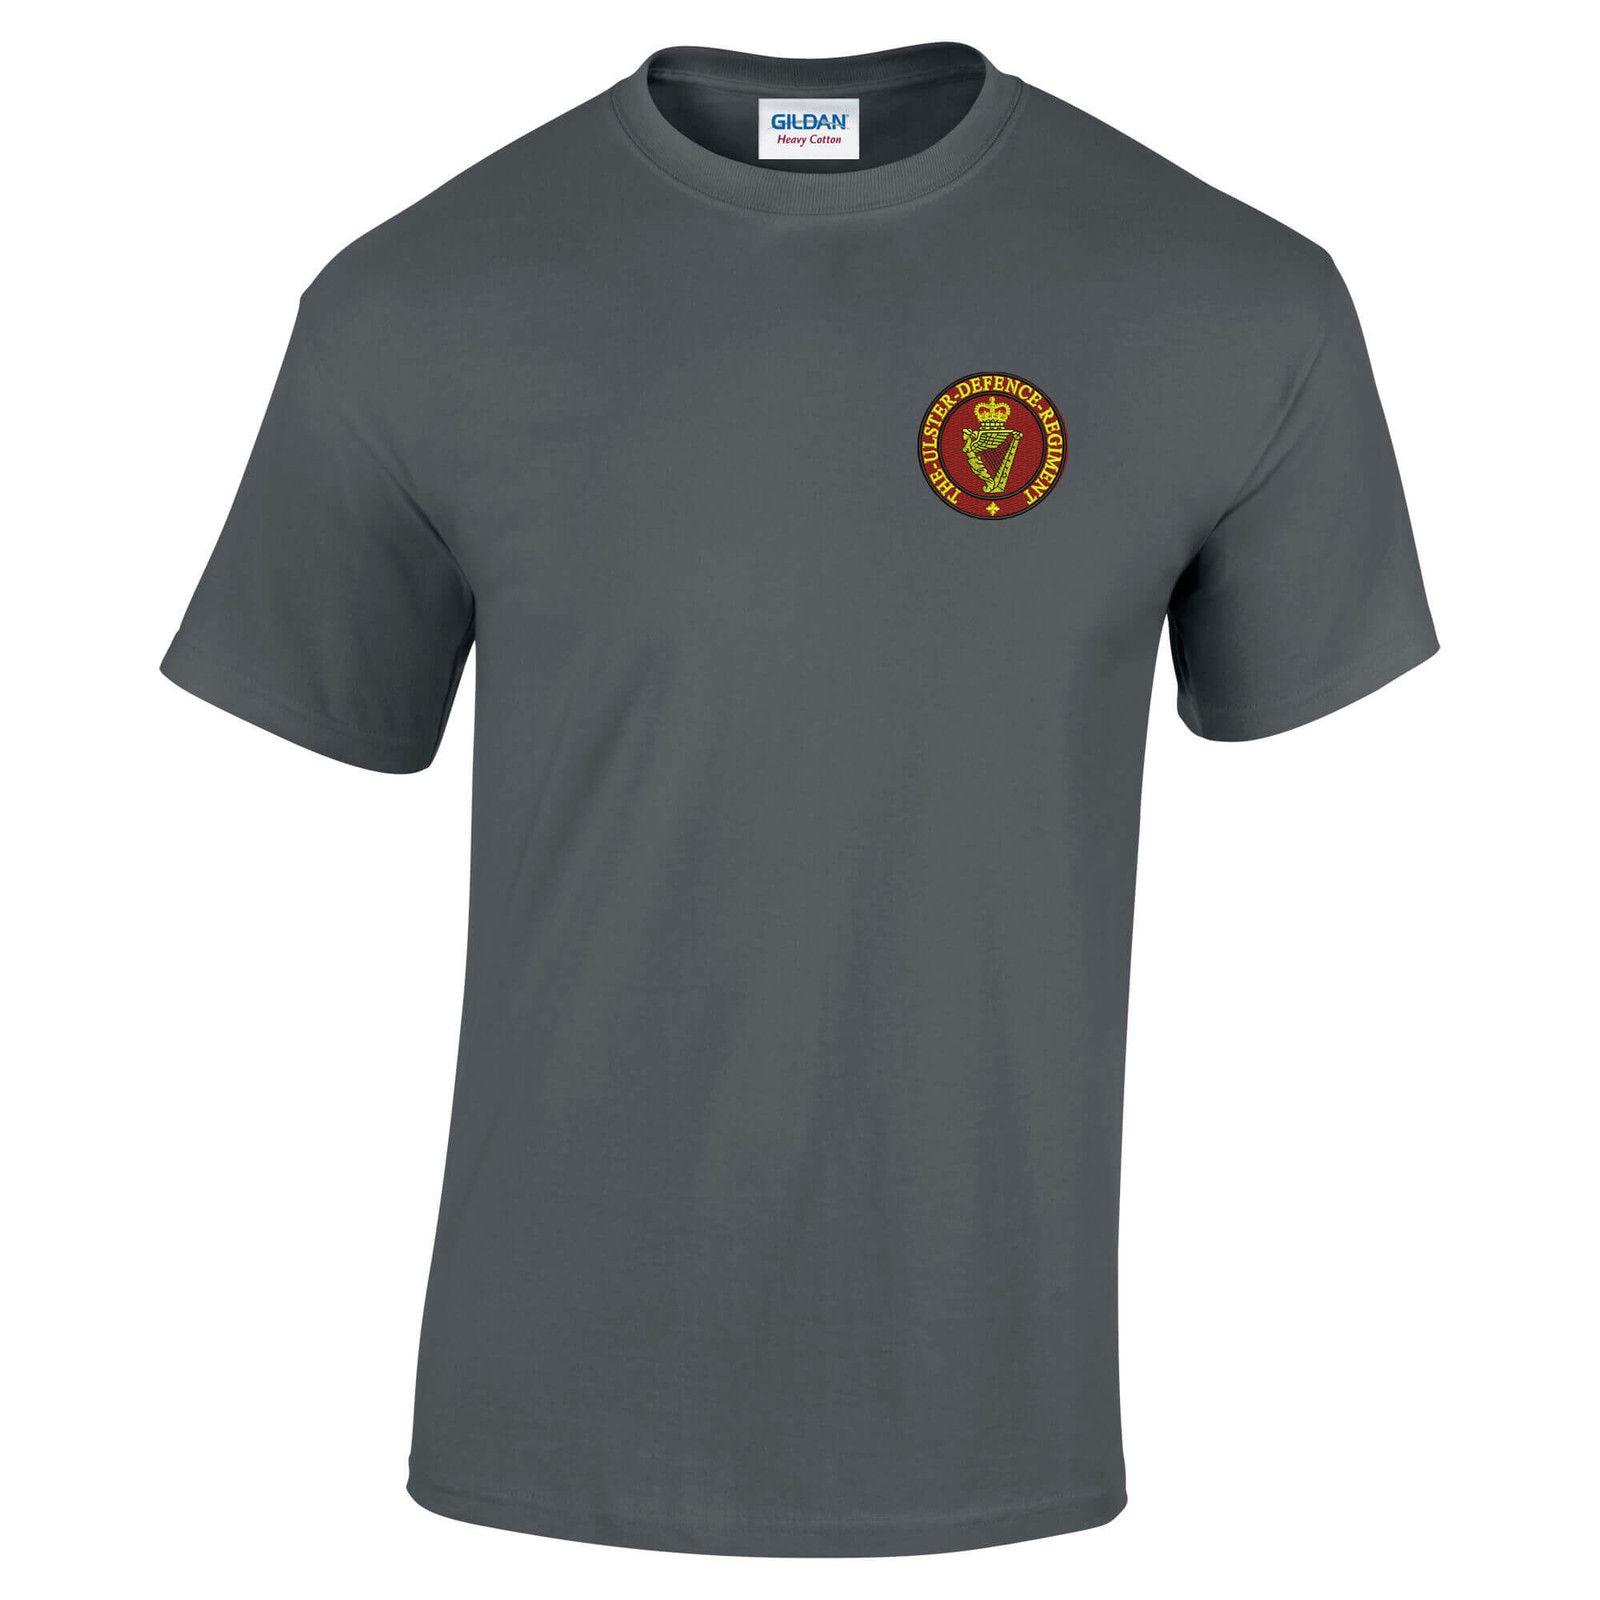 2018 Fashion Short Sleeve Black T Shirt 100% Cotton Ulster Defence Regimentkids T Shirts